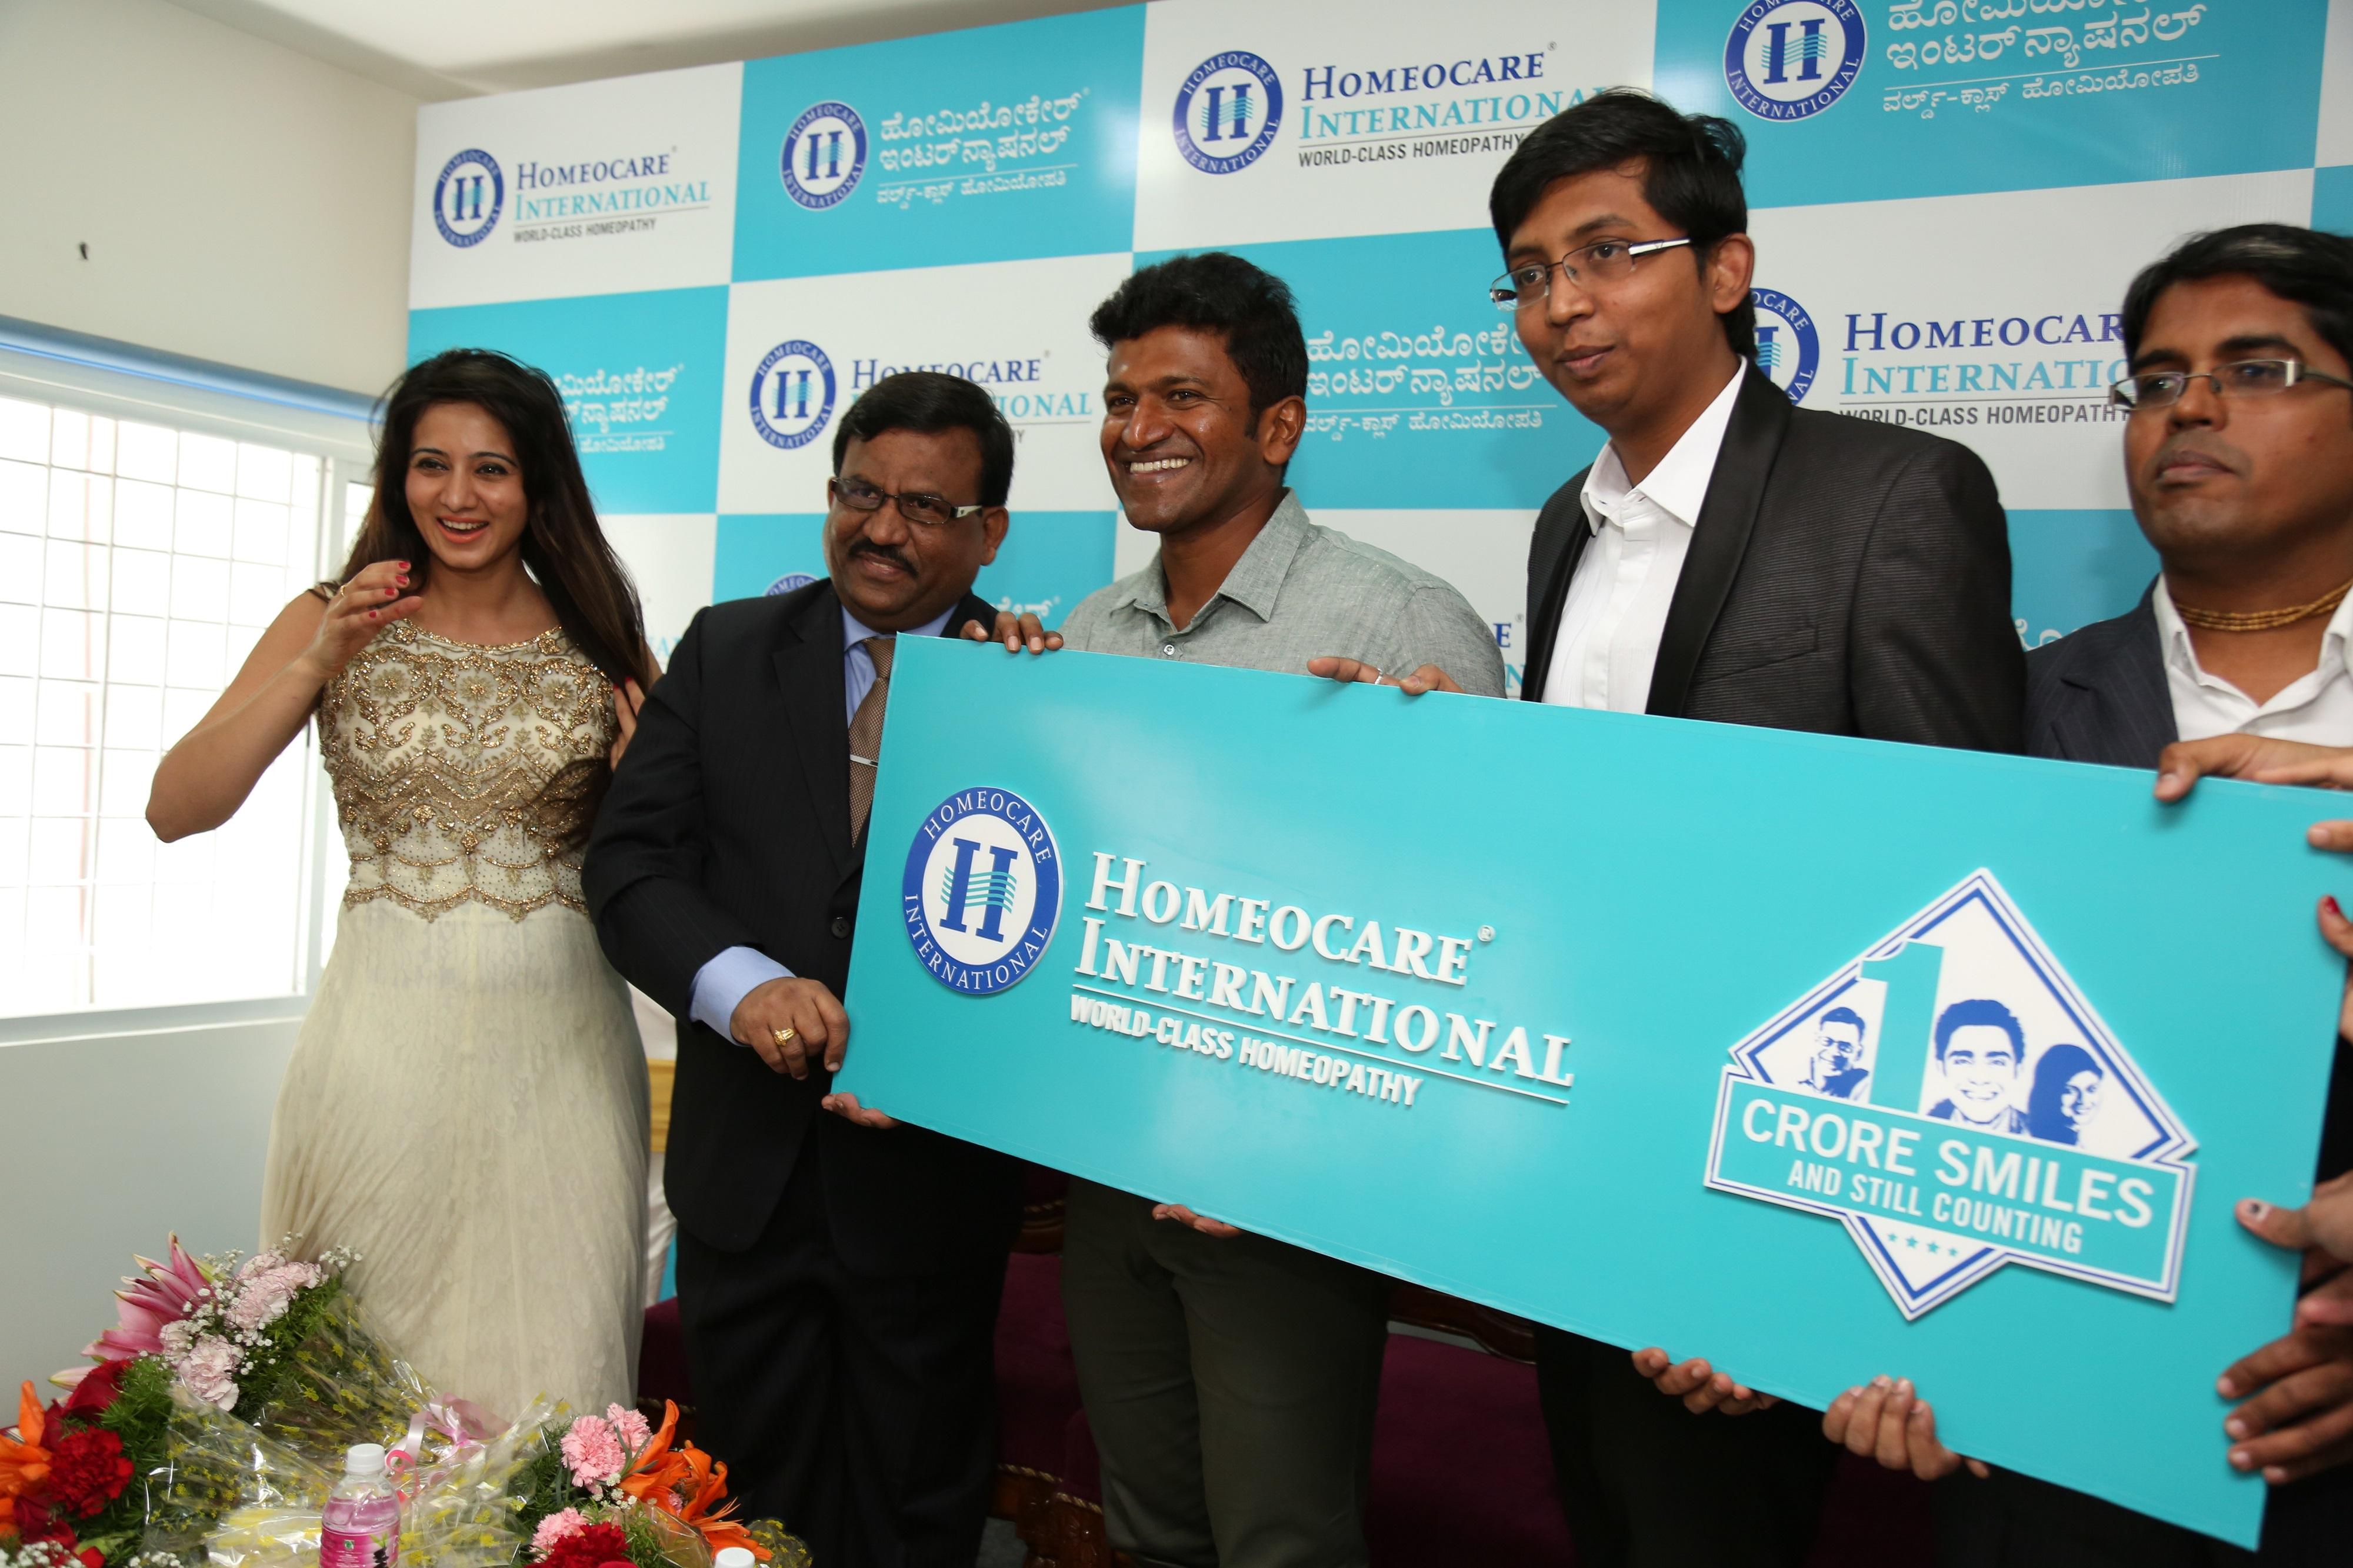 Homeocare International malleswaram branch inauguration2